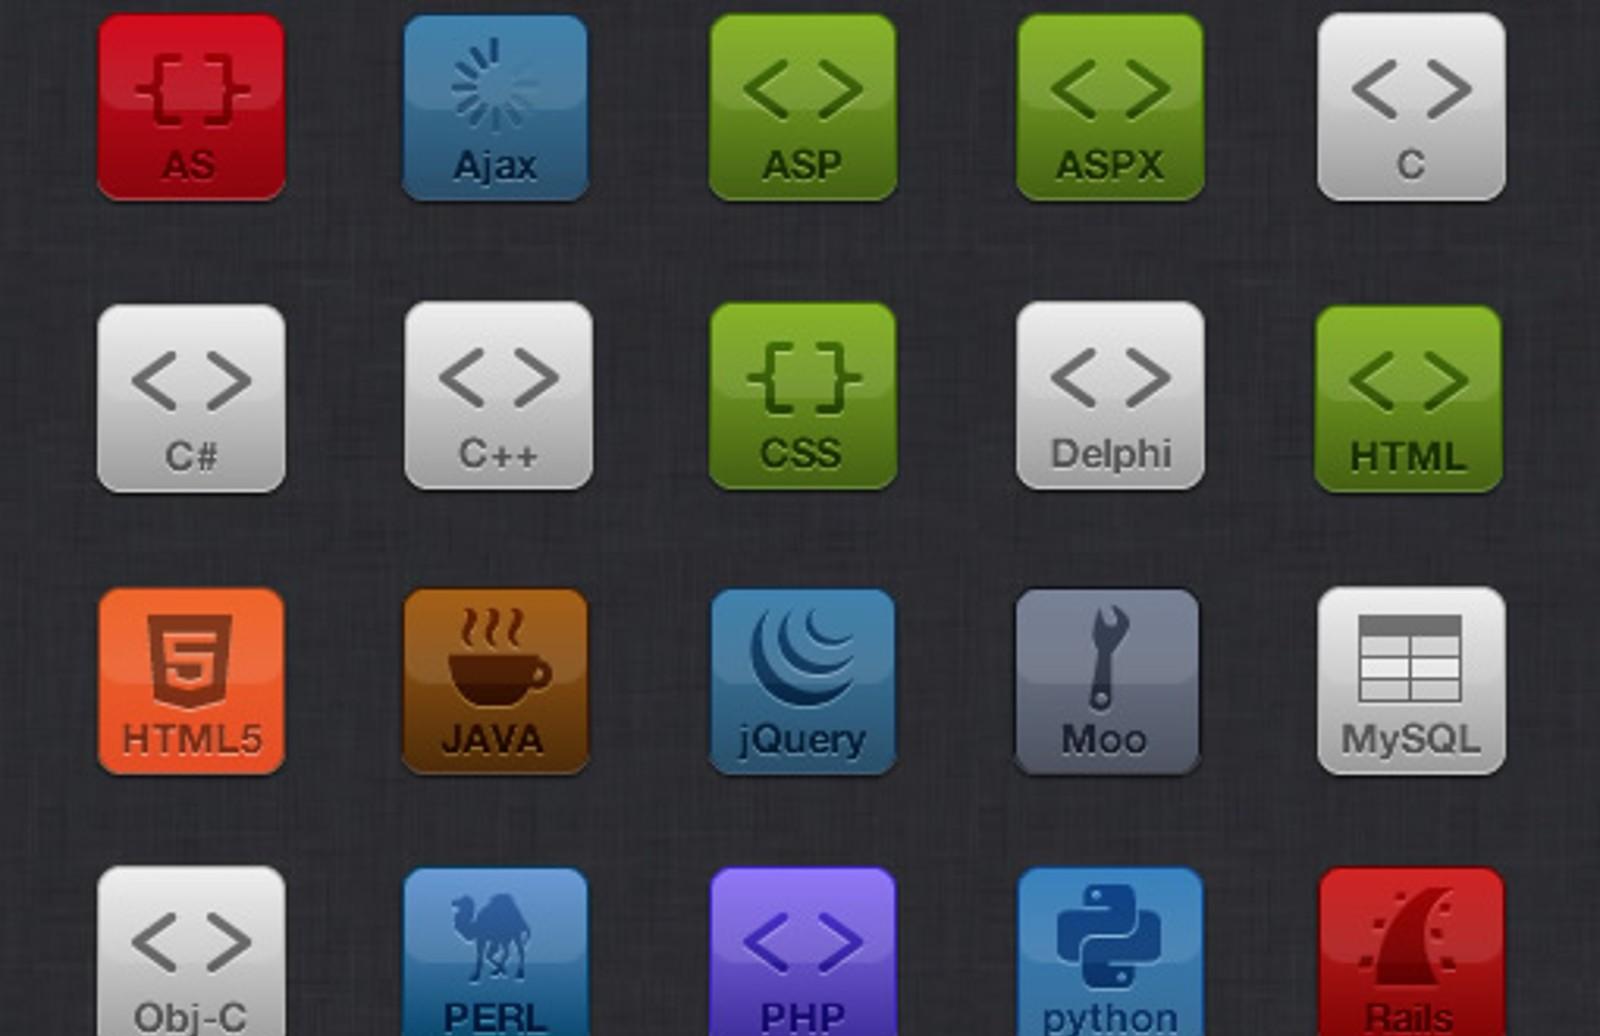 Programminglanguages Preview Image